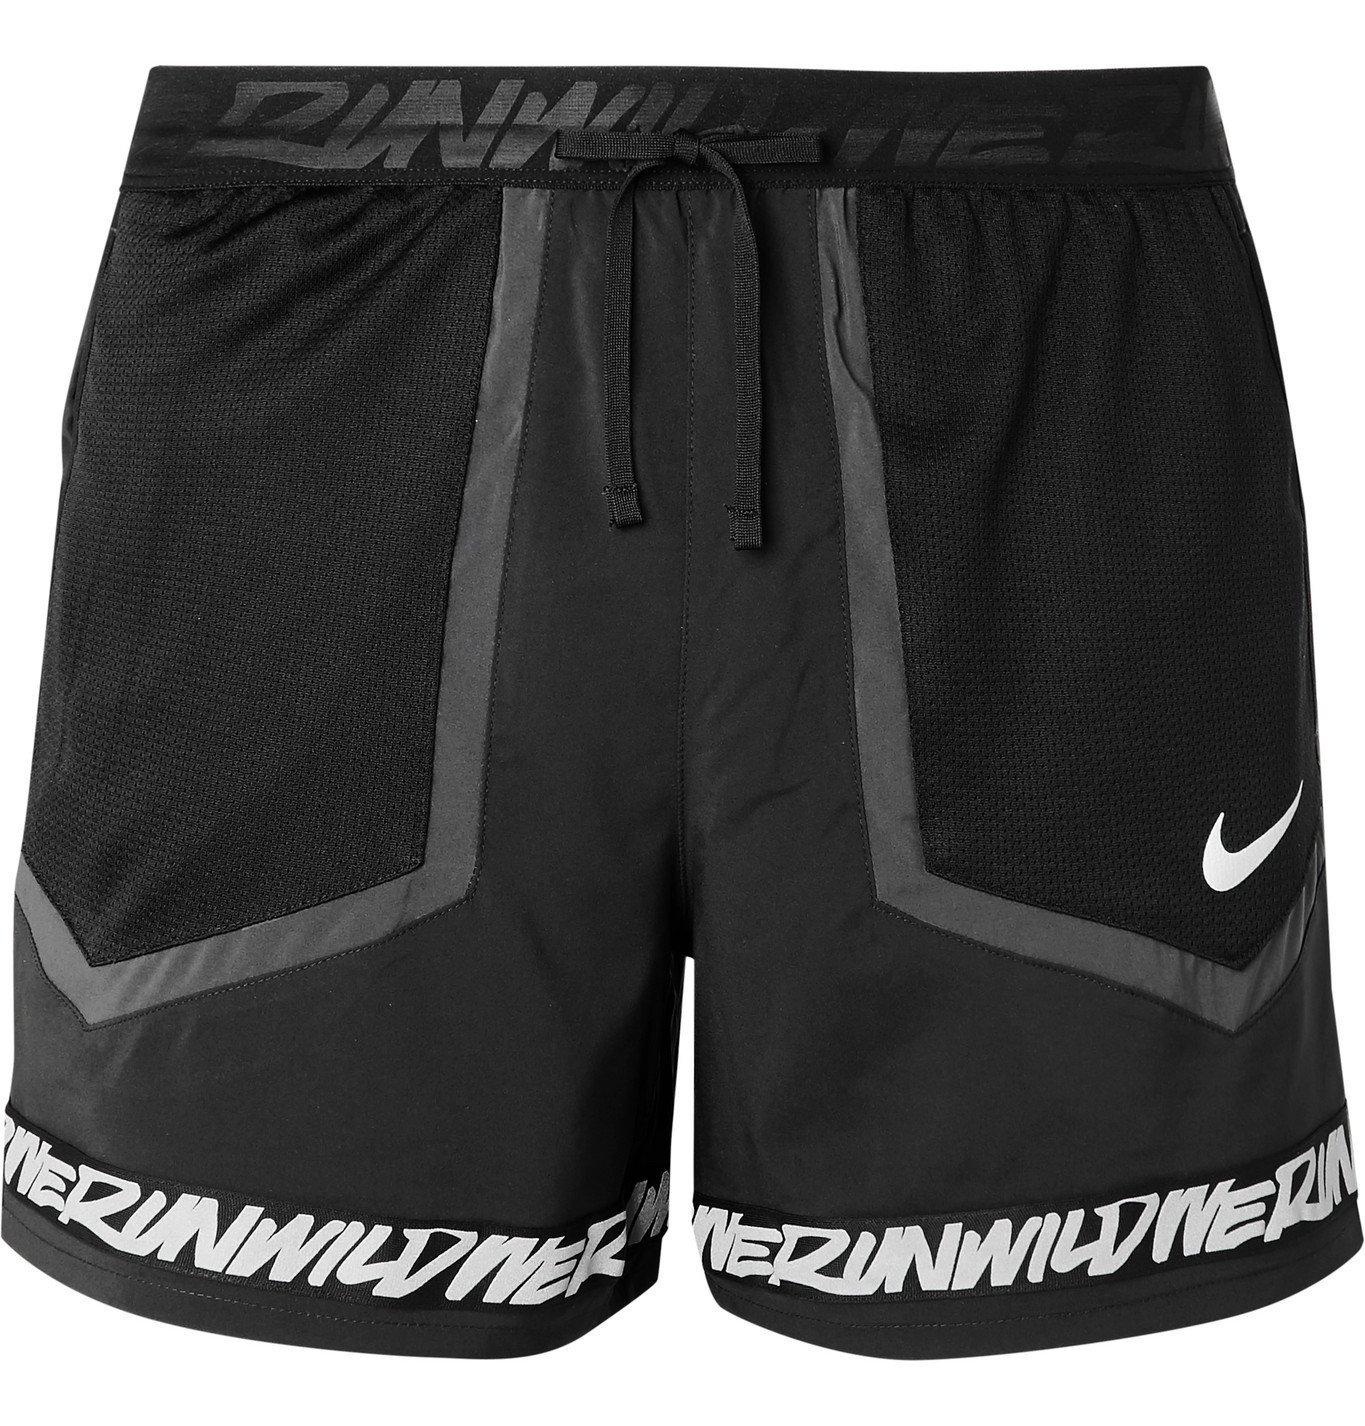 Nike Running - Flex Stride Wild Run Printed Mesh-Panelled Shell Running Shorts - Black